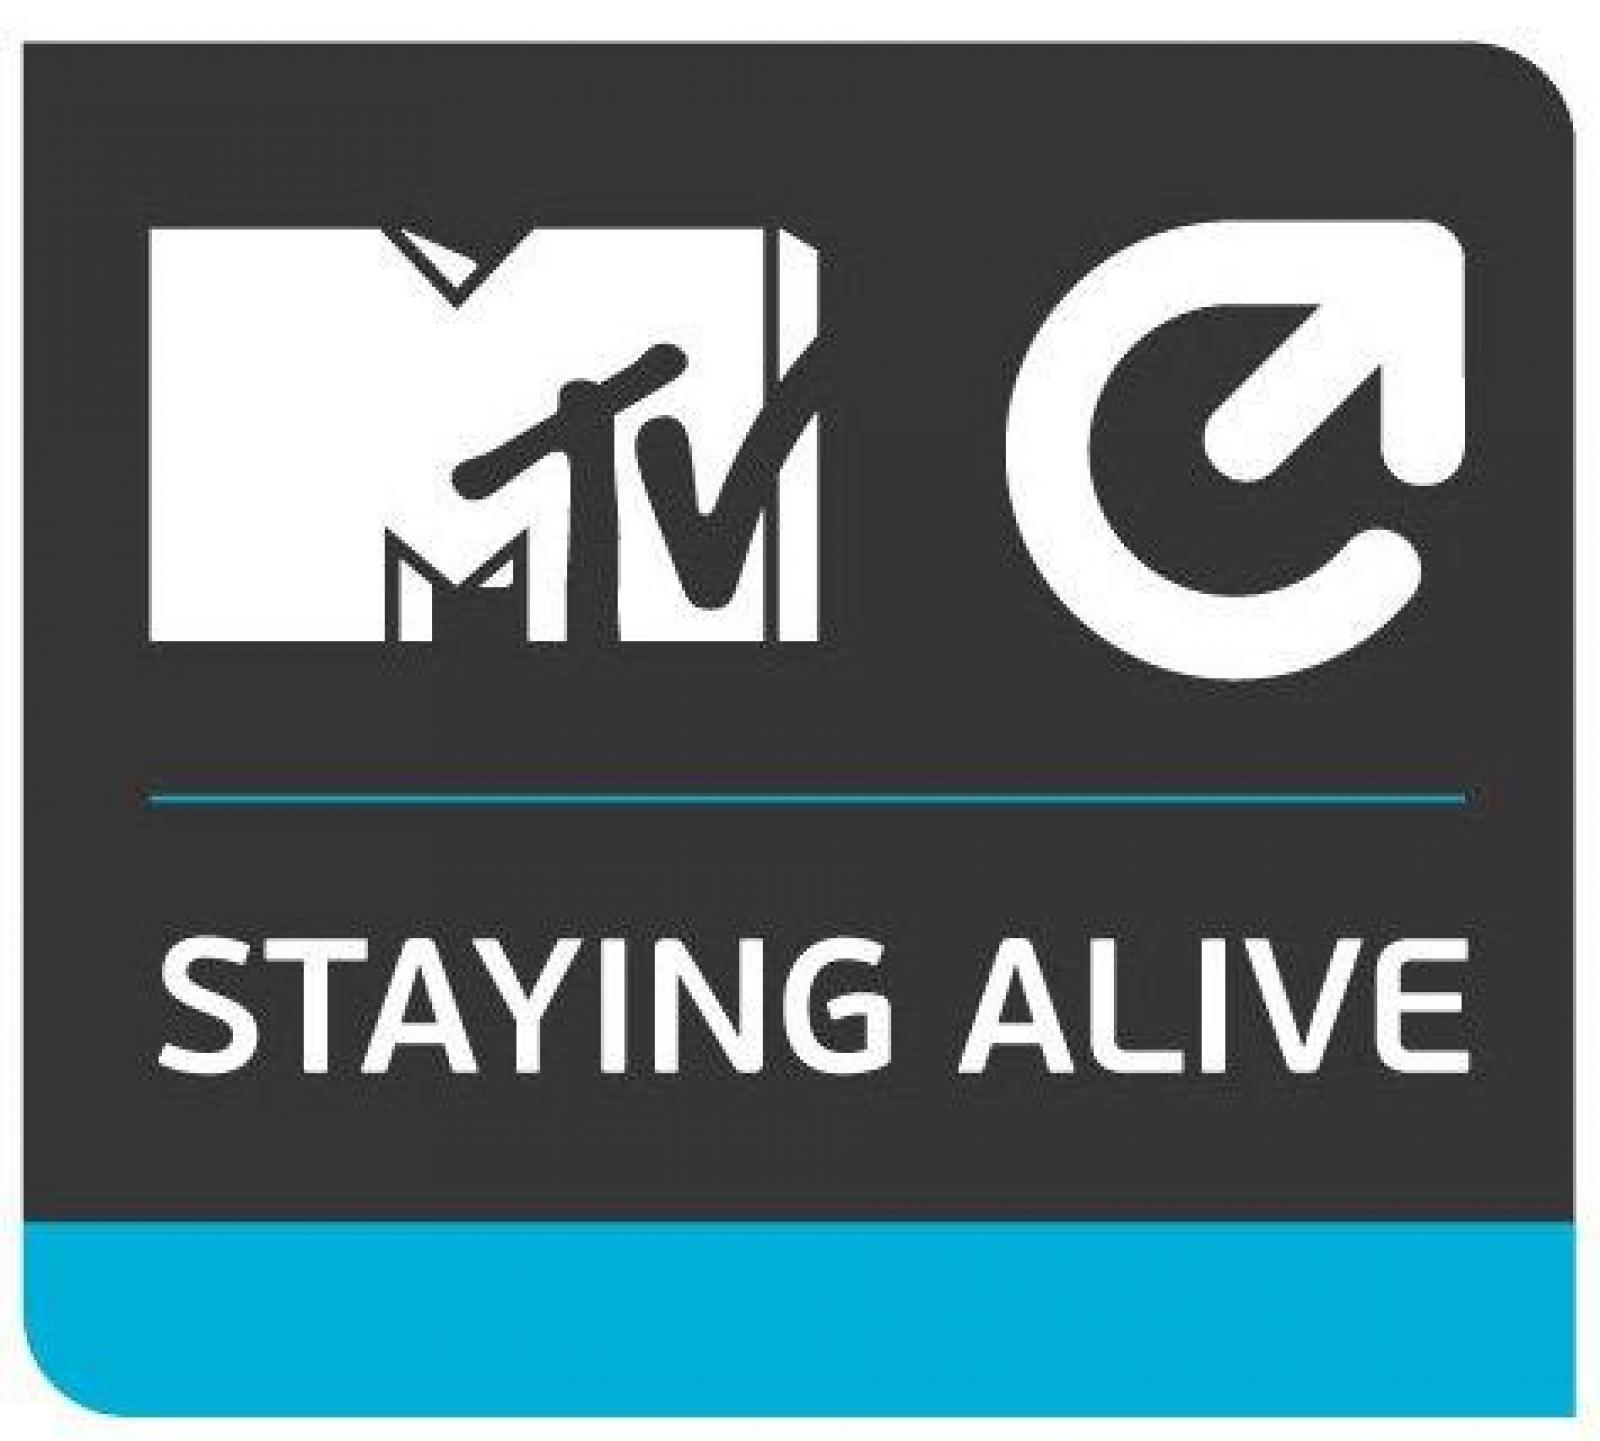 Staying Alive New final_logo.jpg